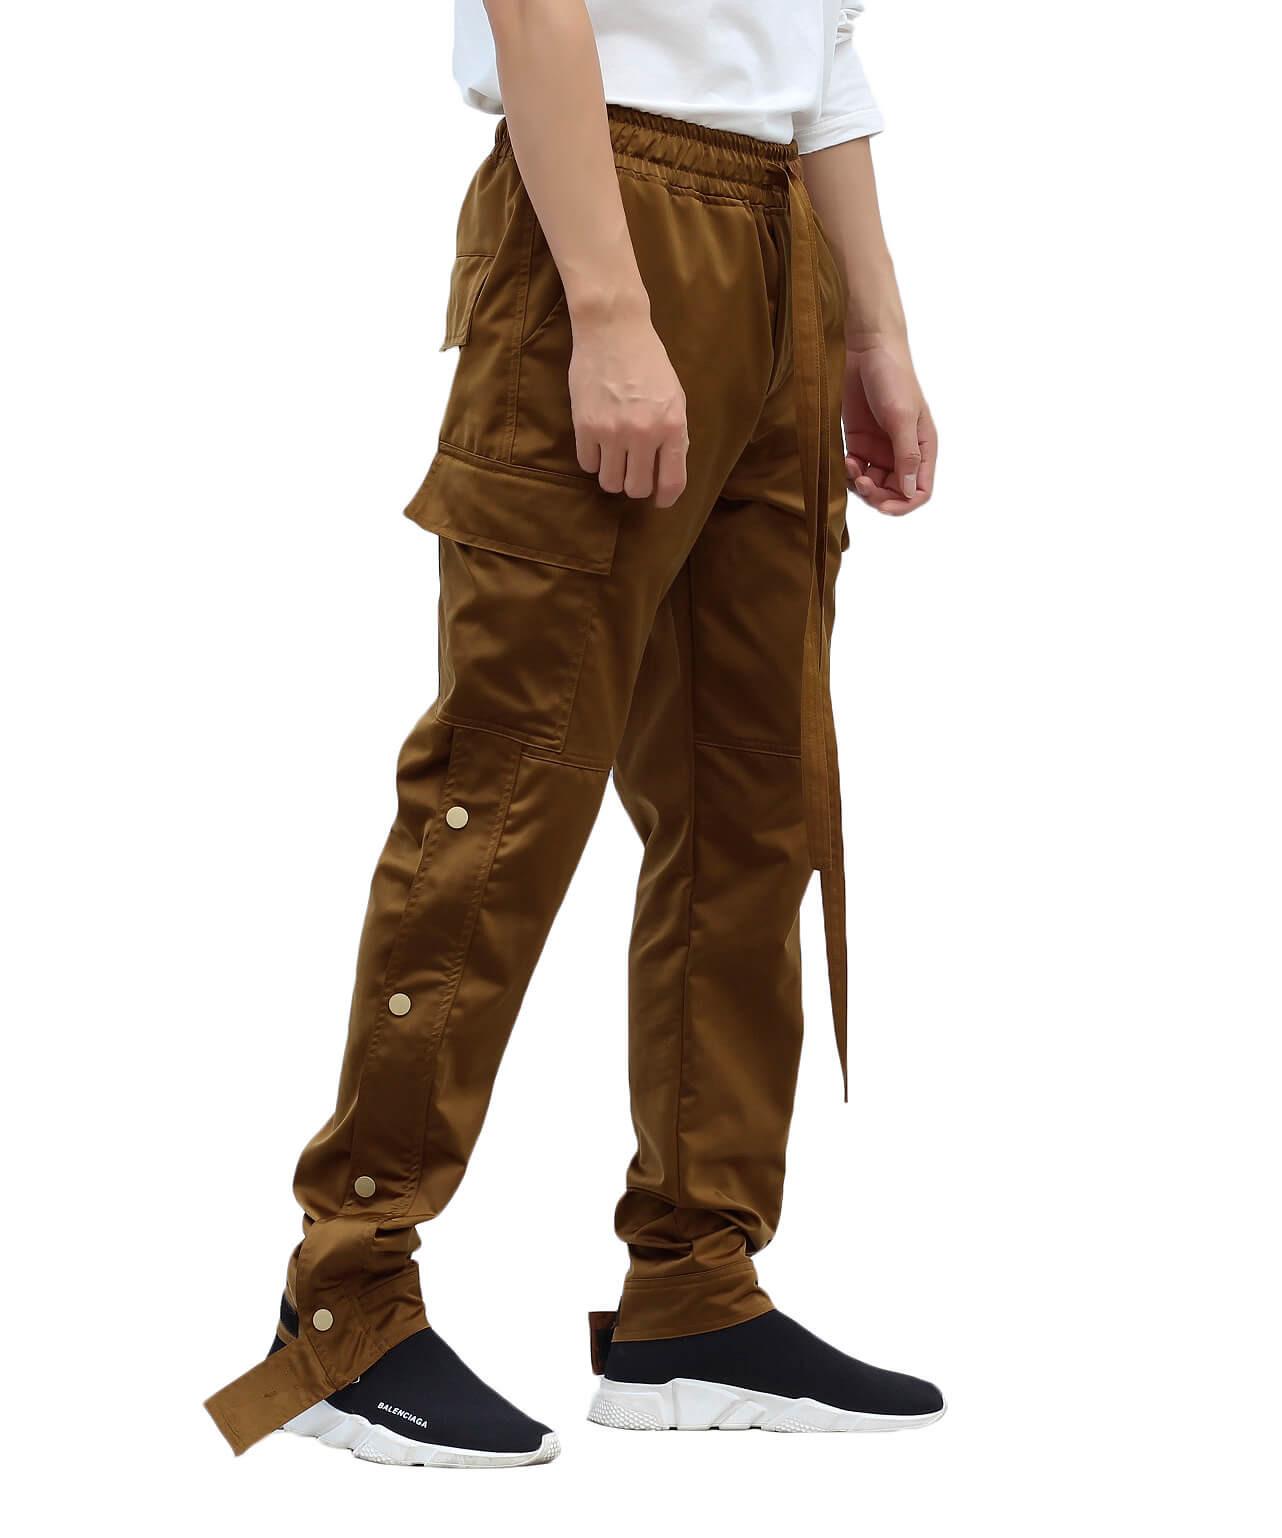 Nylon Snap Cargo Pants - Brown